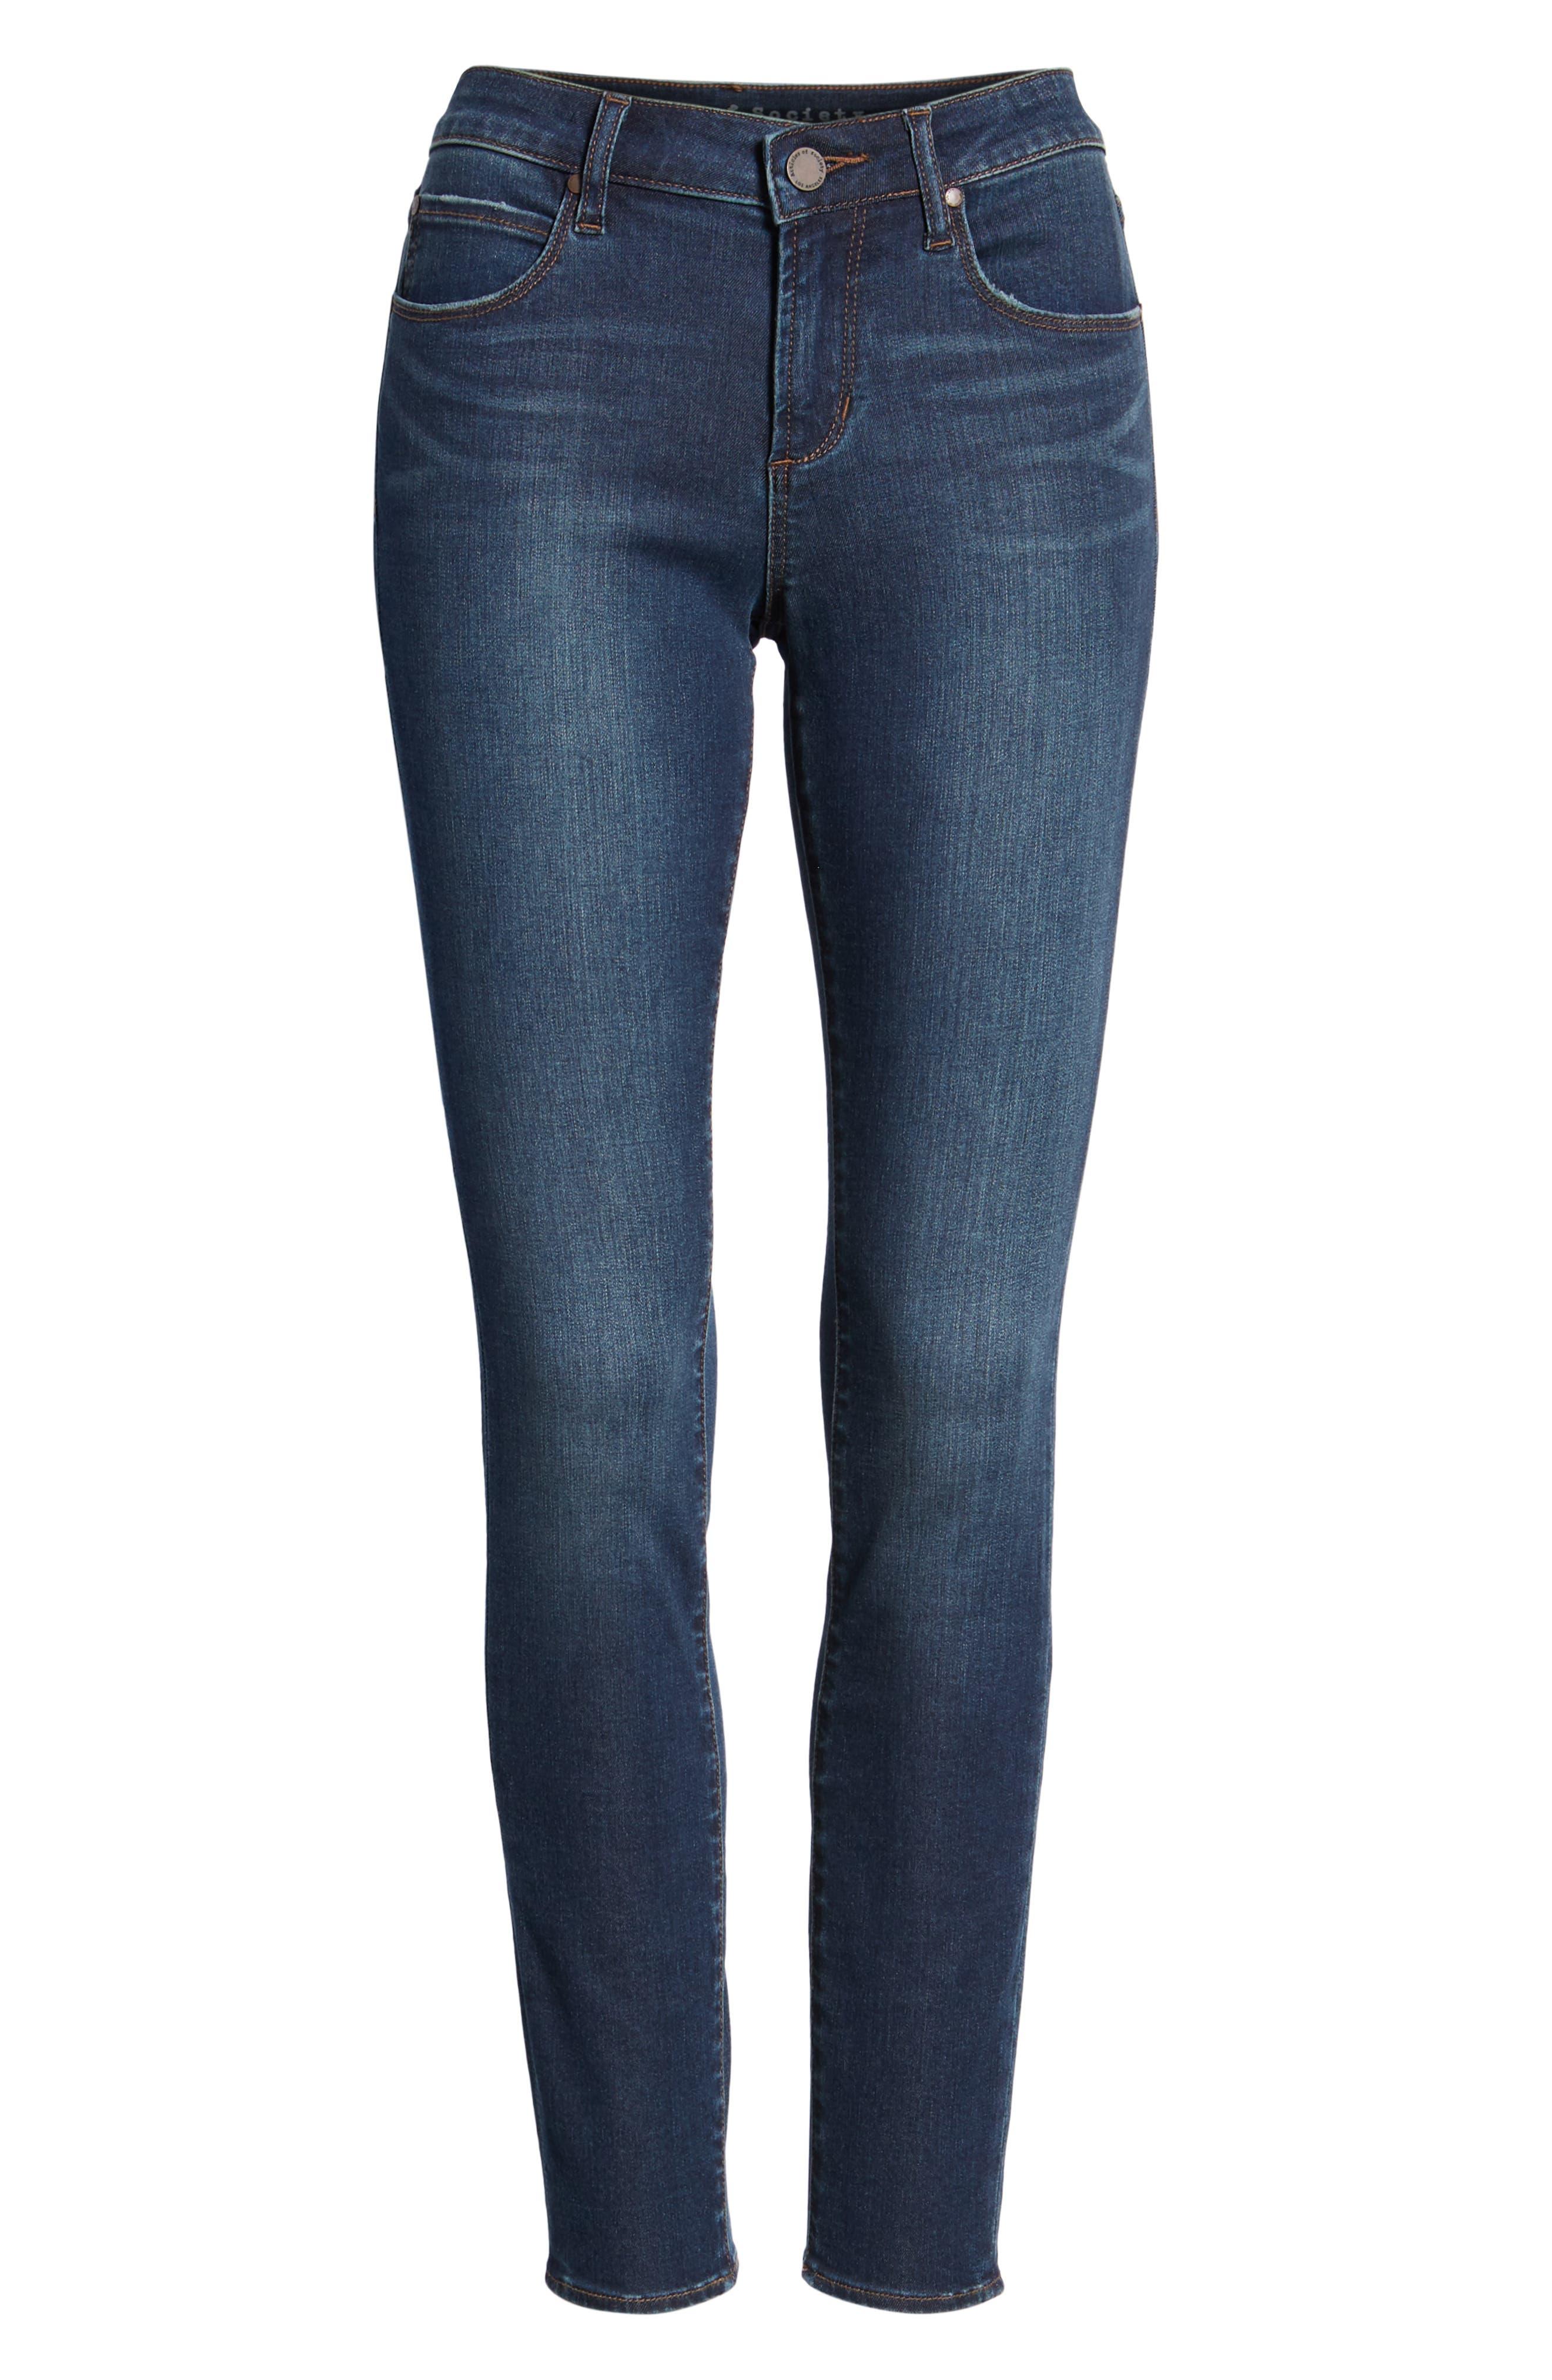 Sarah Skinny Jeans,                             Alternate thumbnail 7, color,                             SILVER LAKE